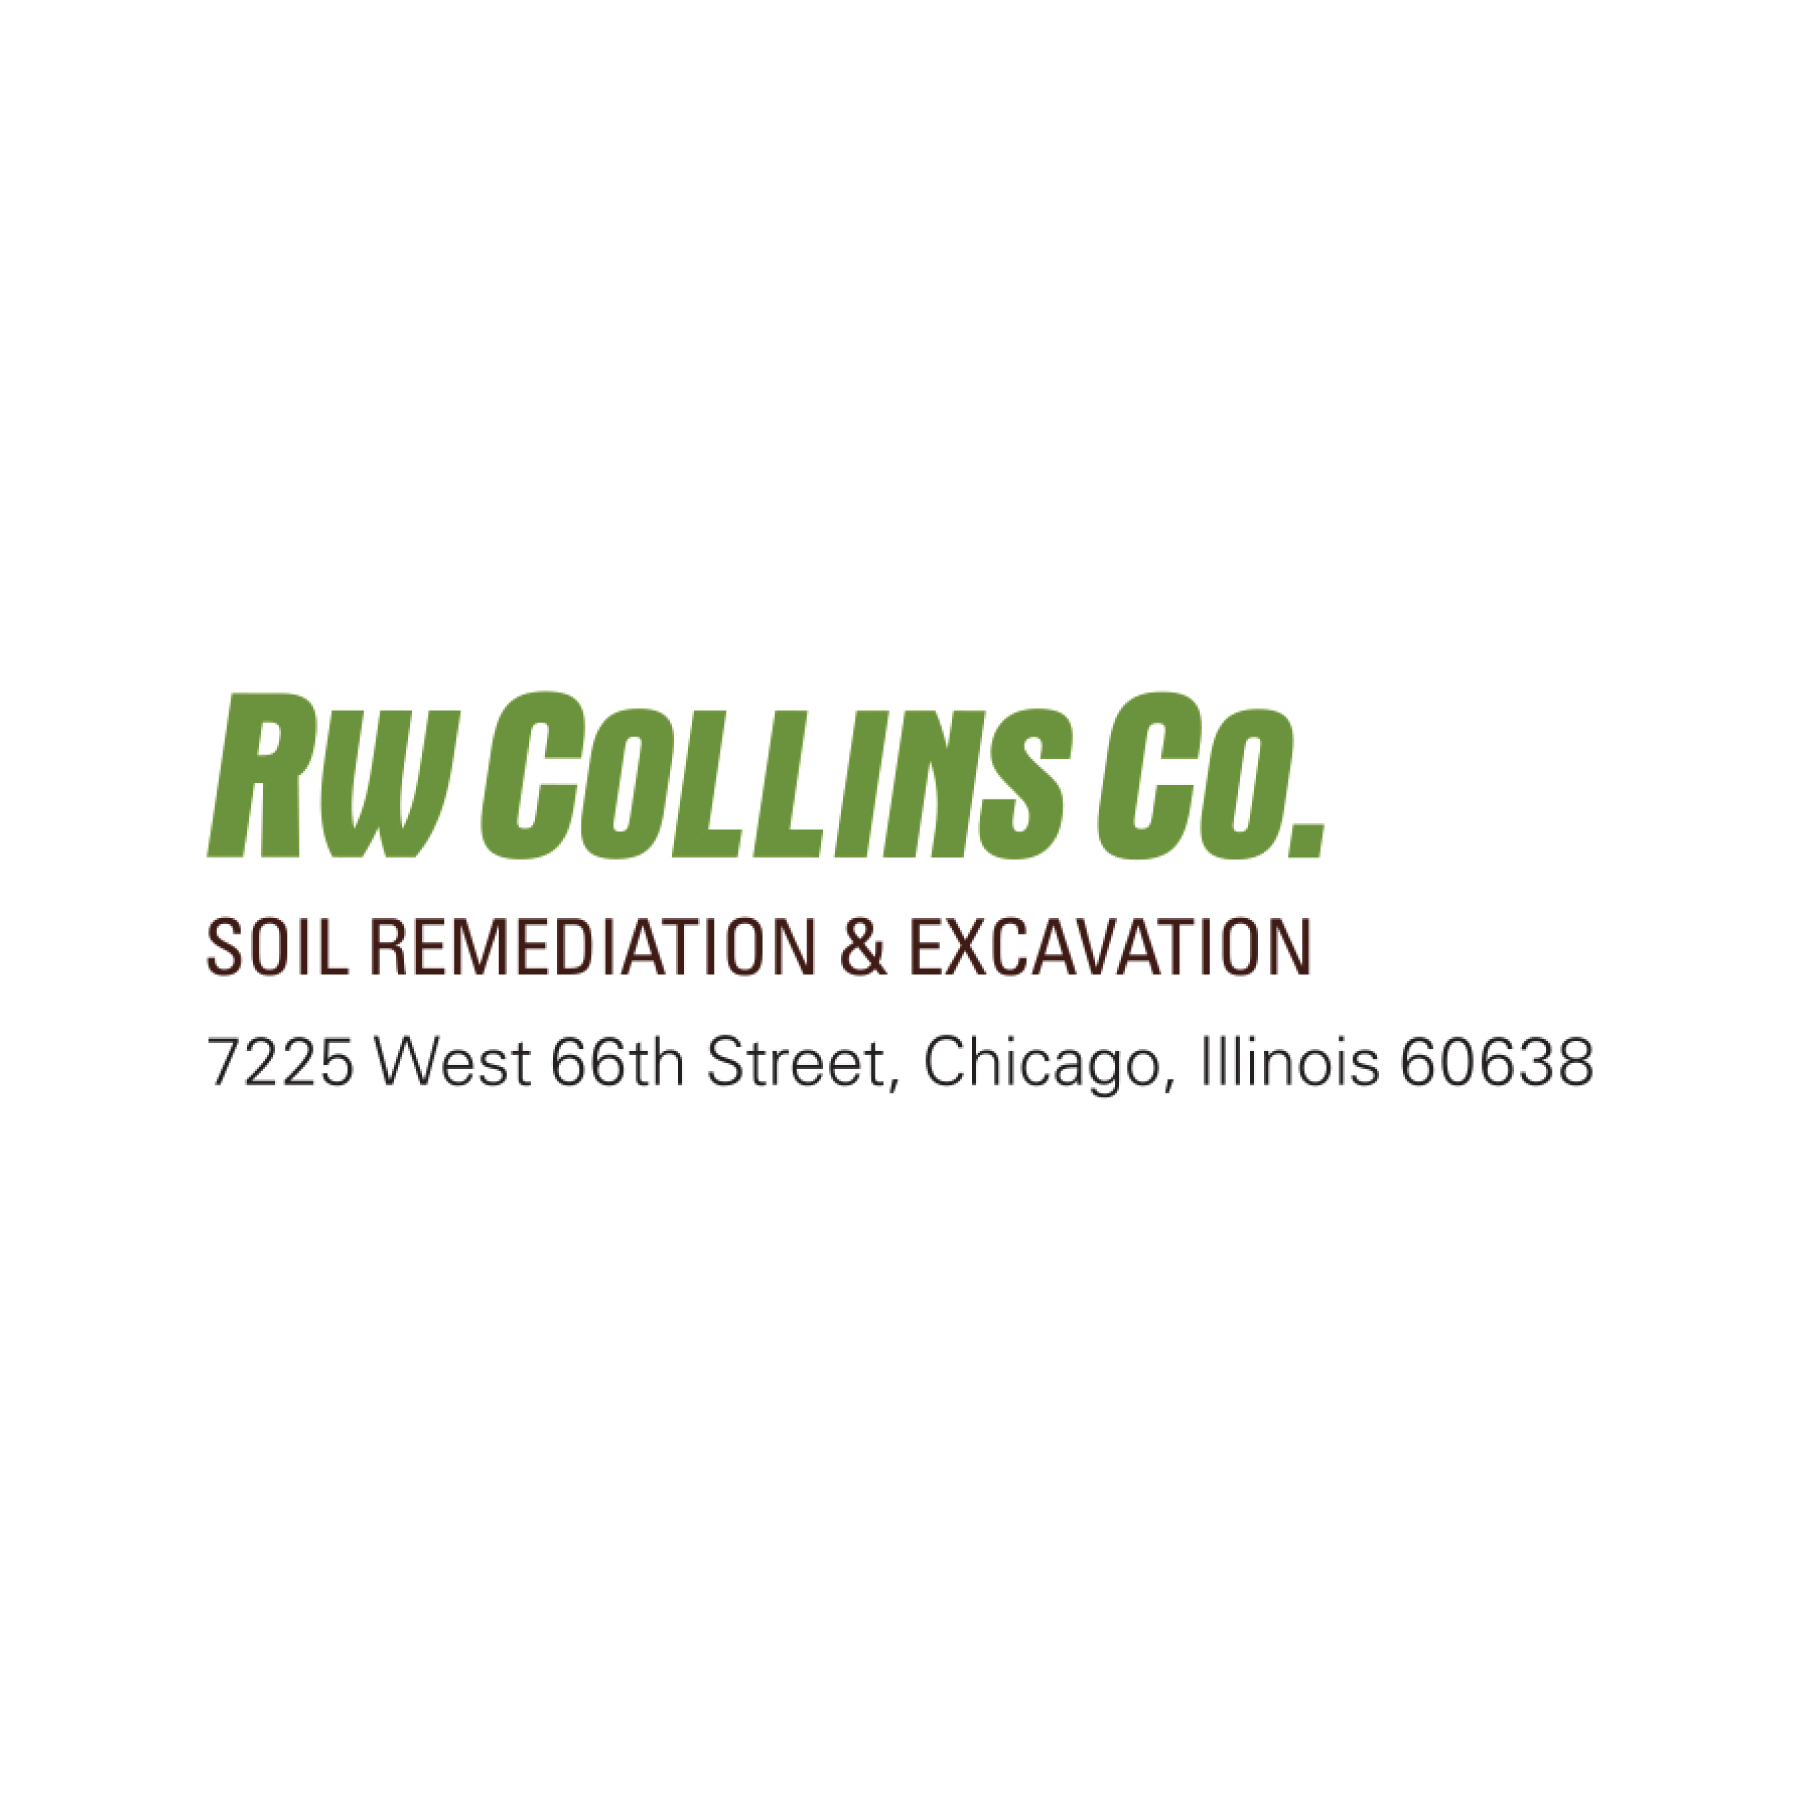 RW Collins